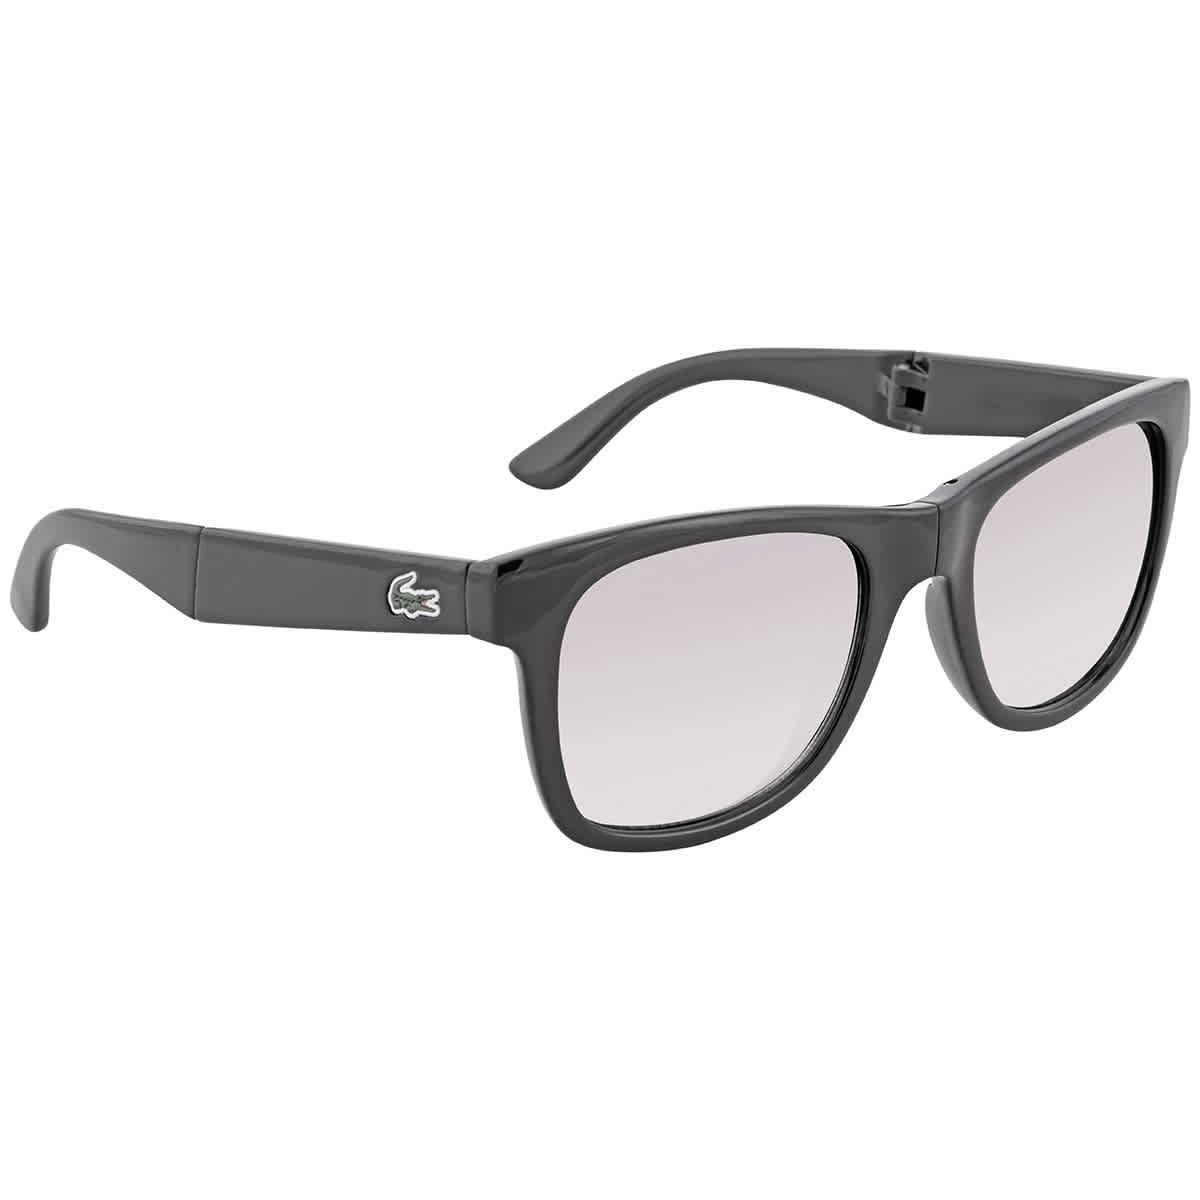 Lacoste Grey Gradient Square Unisex Sunglasses L778s 001 52 In Black